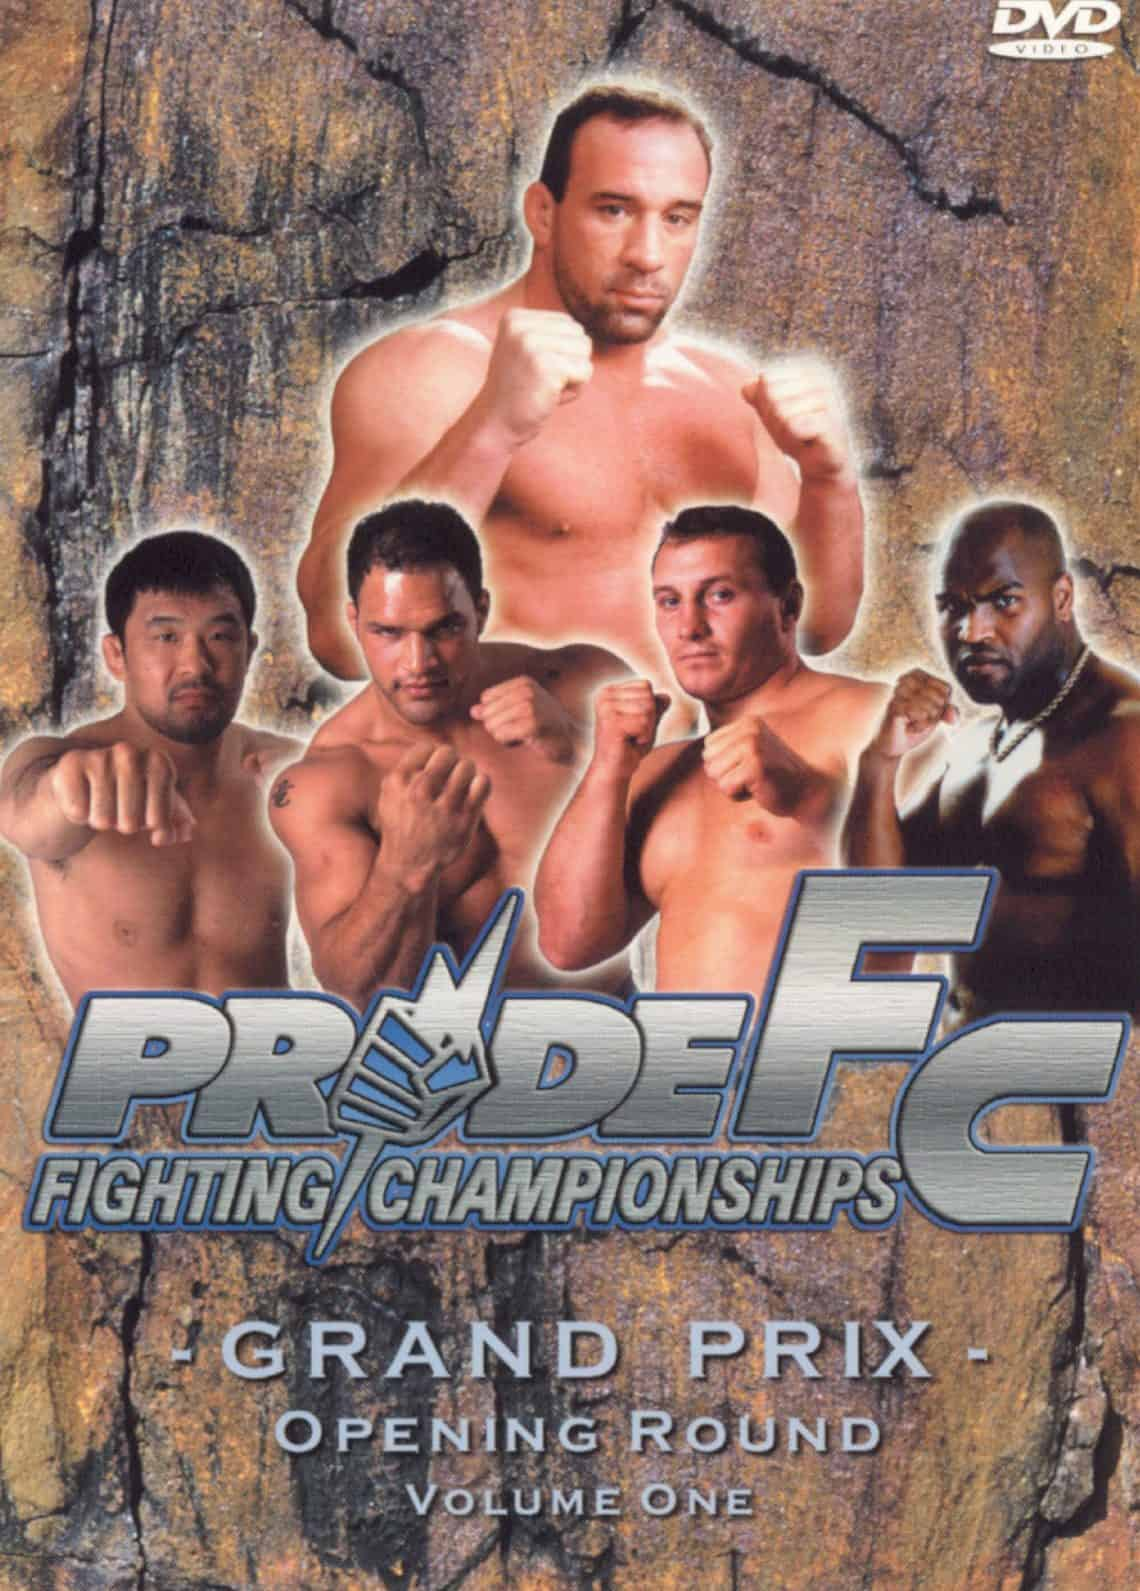 Pride FC: Grand Prix 2000 - Opening Round 1